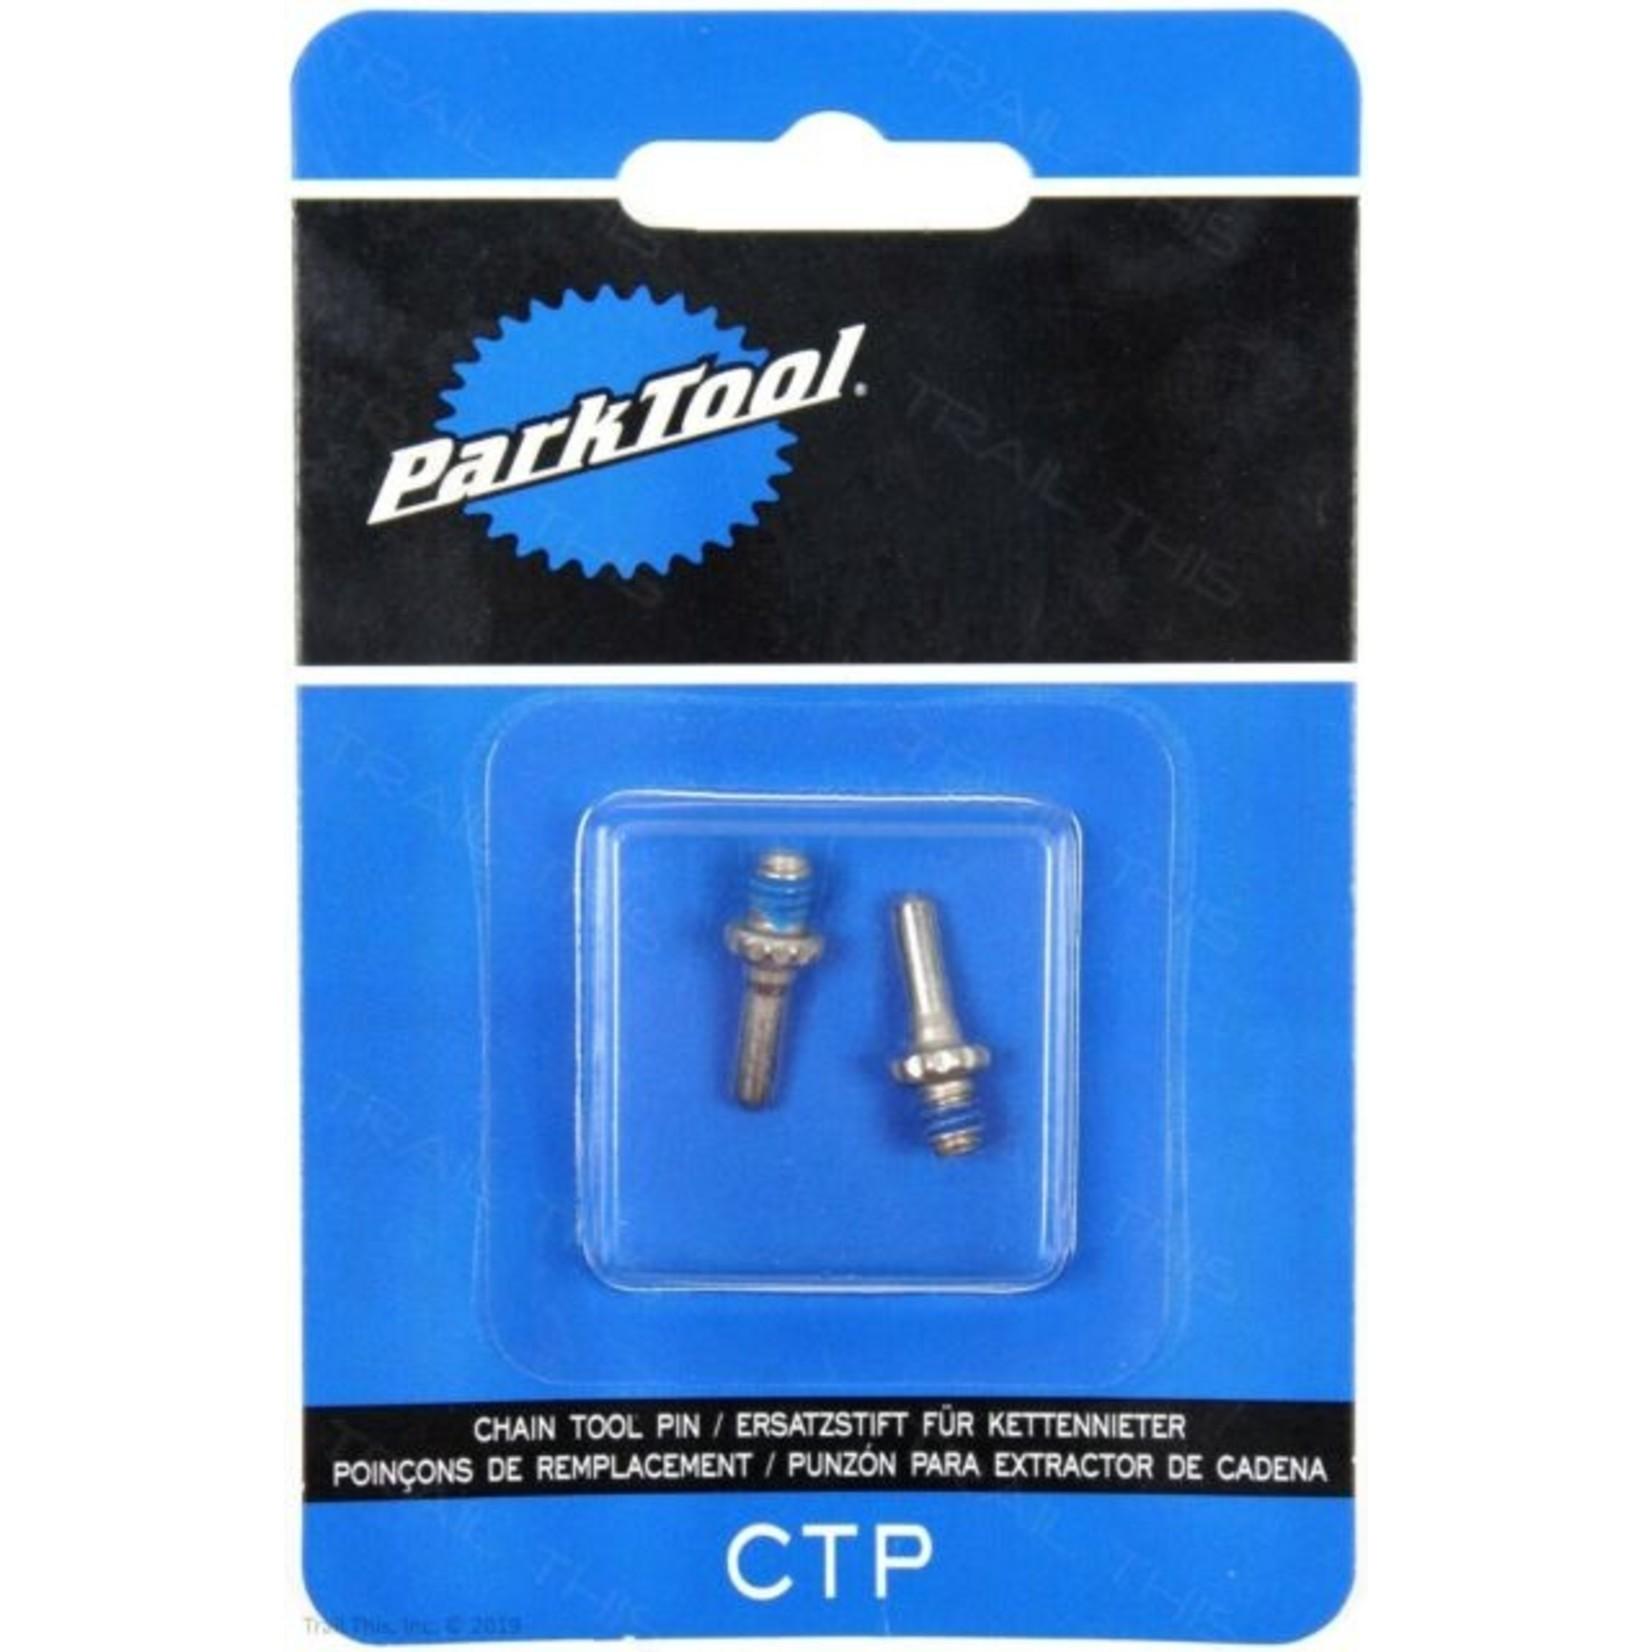 Park Tool Park Tool Chain Tool Pin